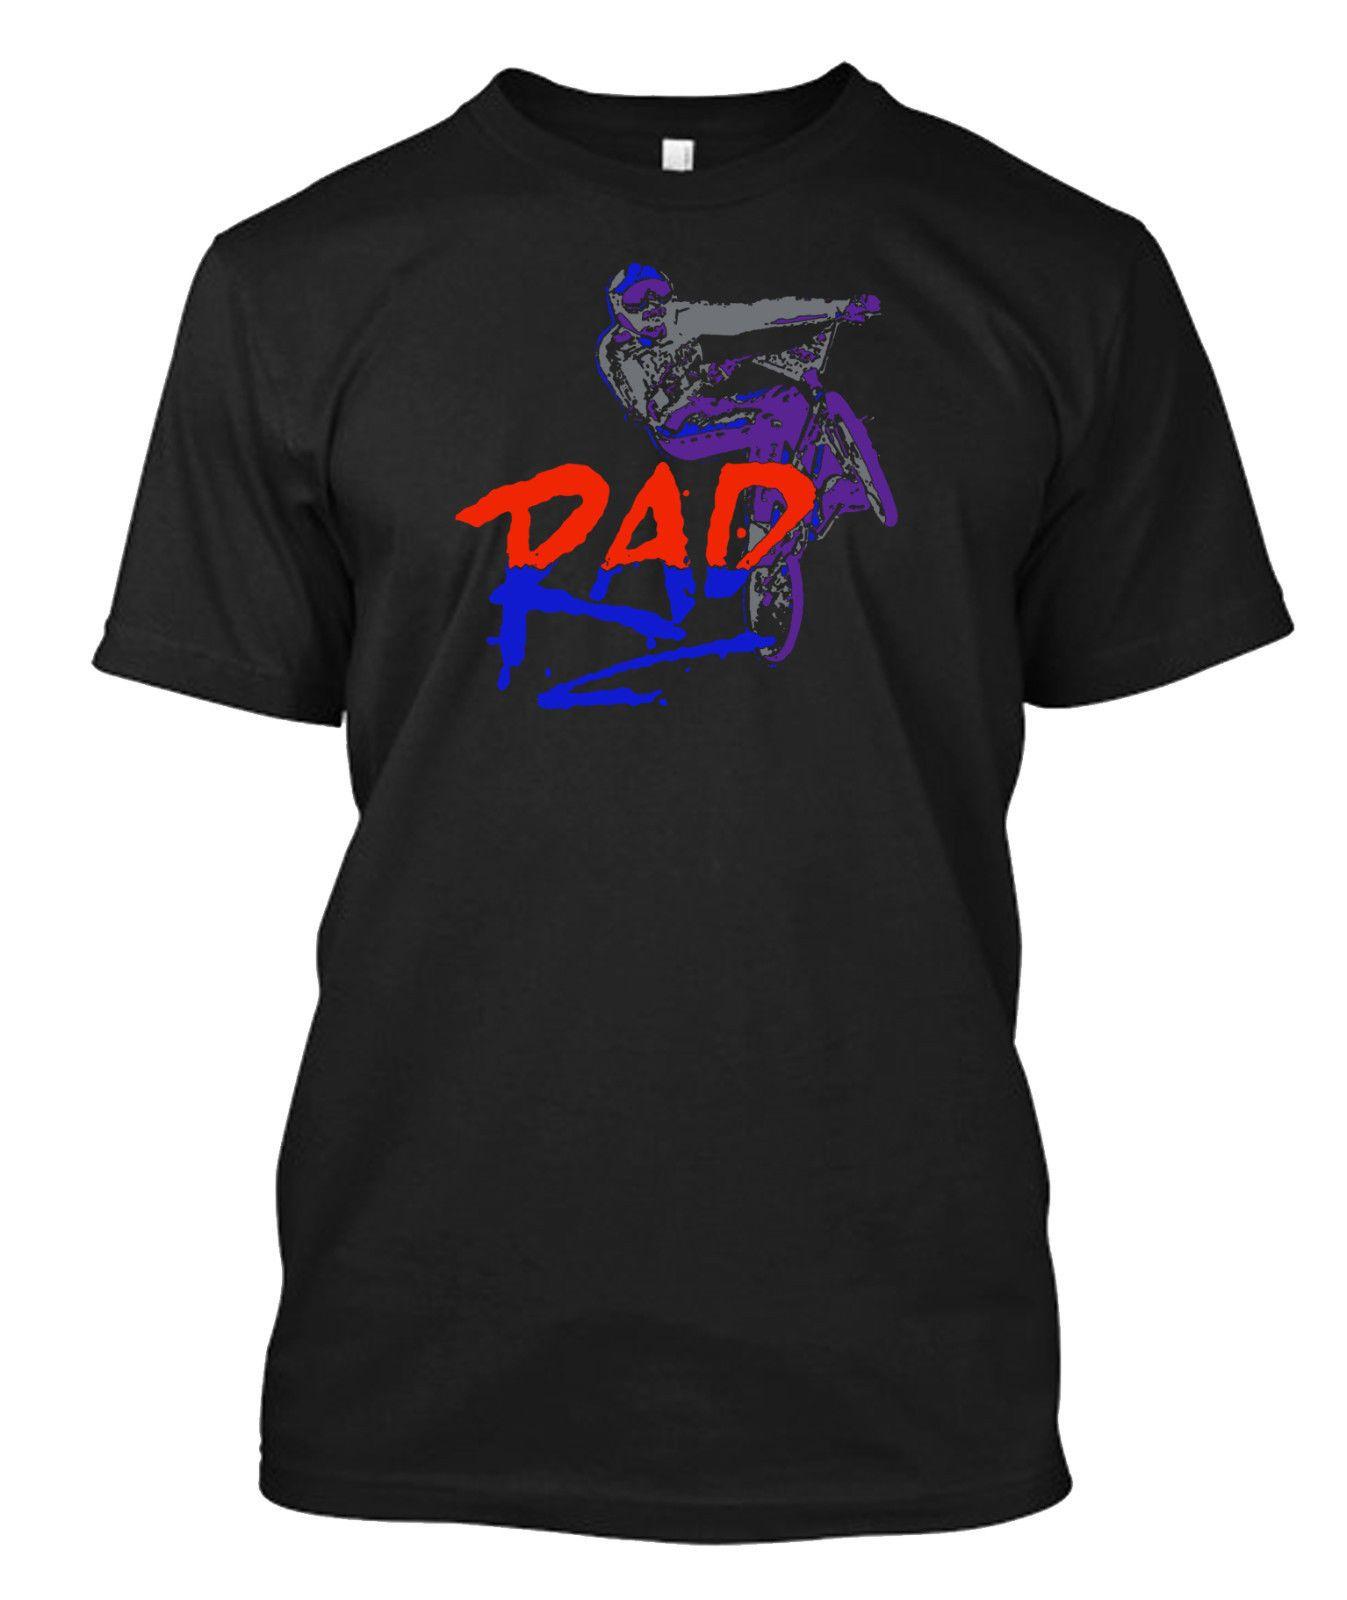 8f9341290 Compre Rad BMX Movie Retro Freestyle 80 s Camiseta Personalizada Camiseta A   10.44 Del Funnytee2u